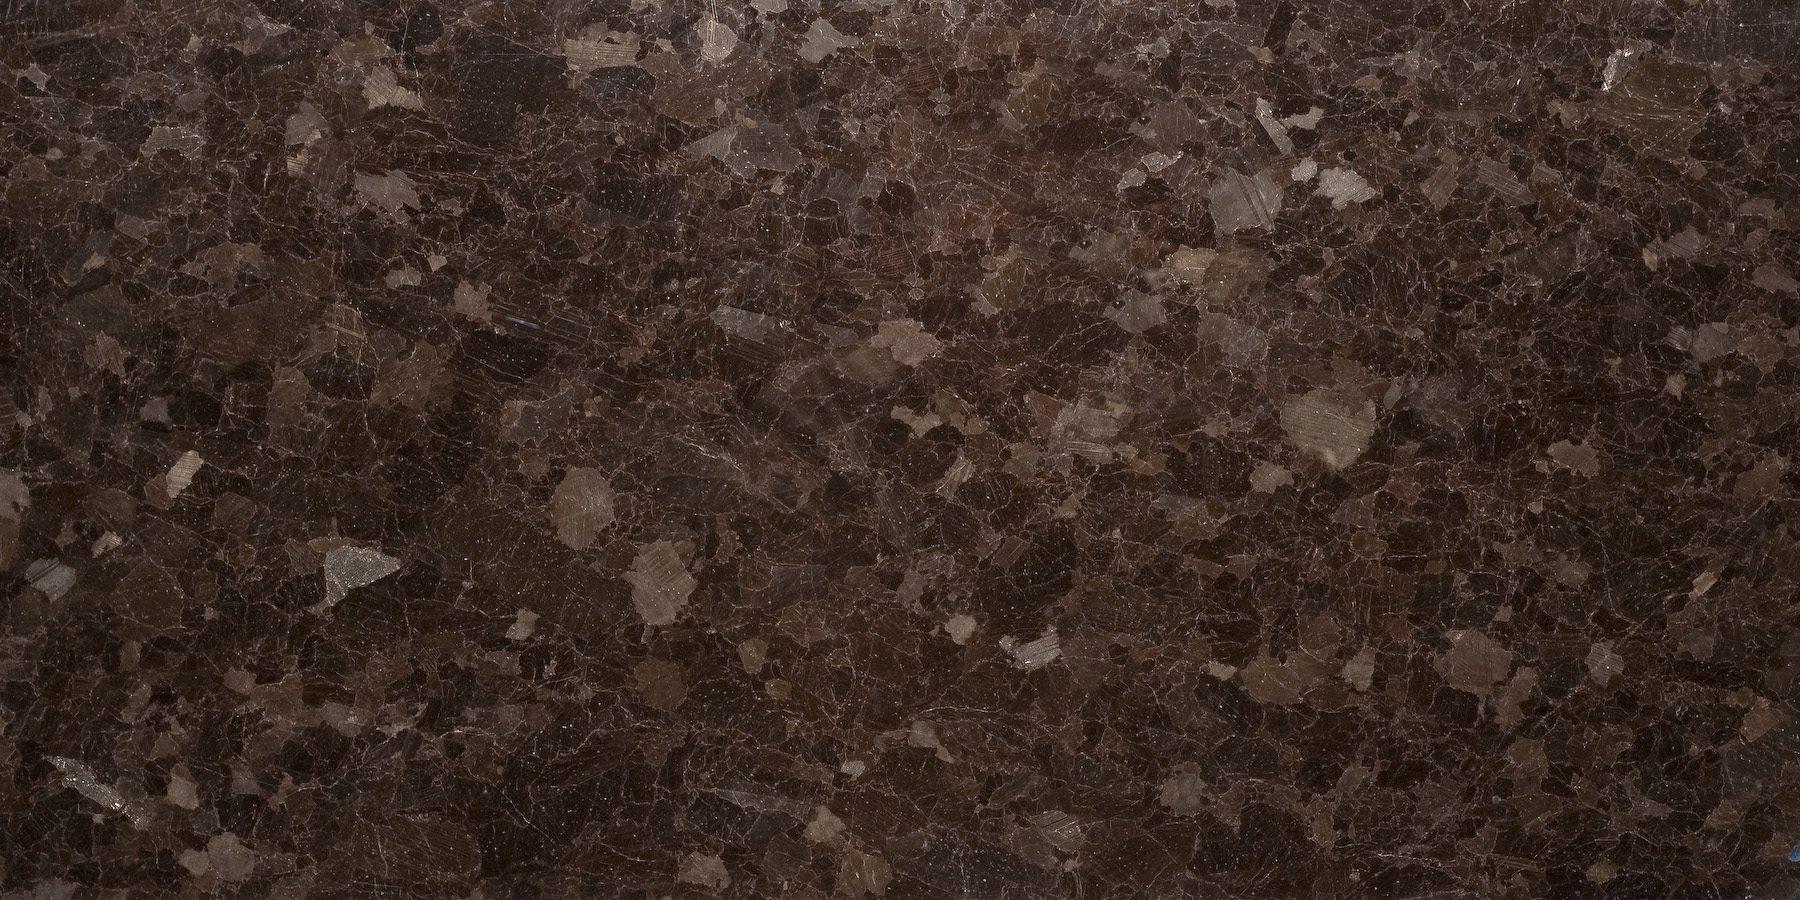 Brown Antique Granite Worx